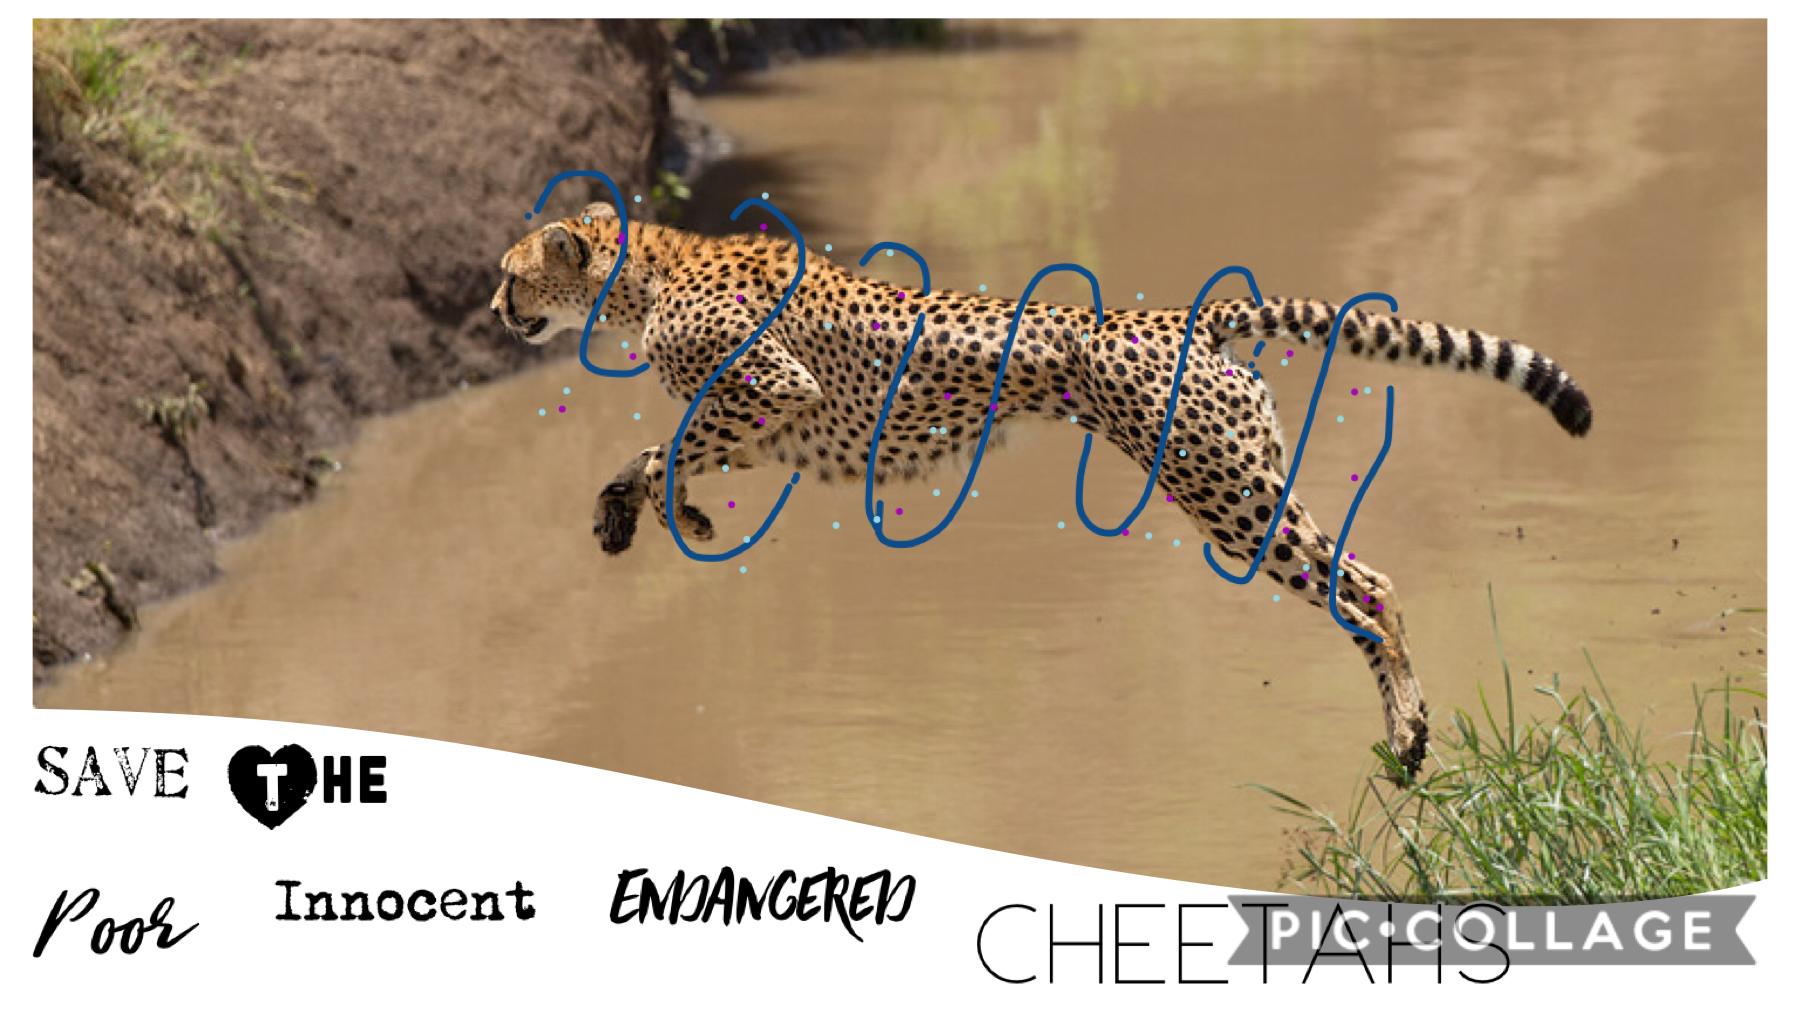 Save the cheetahs people!